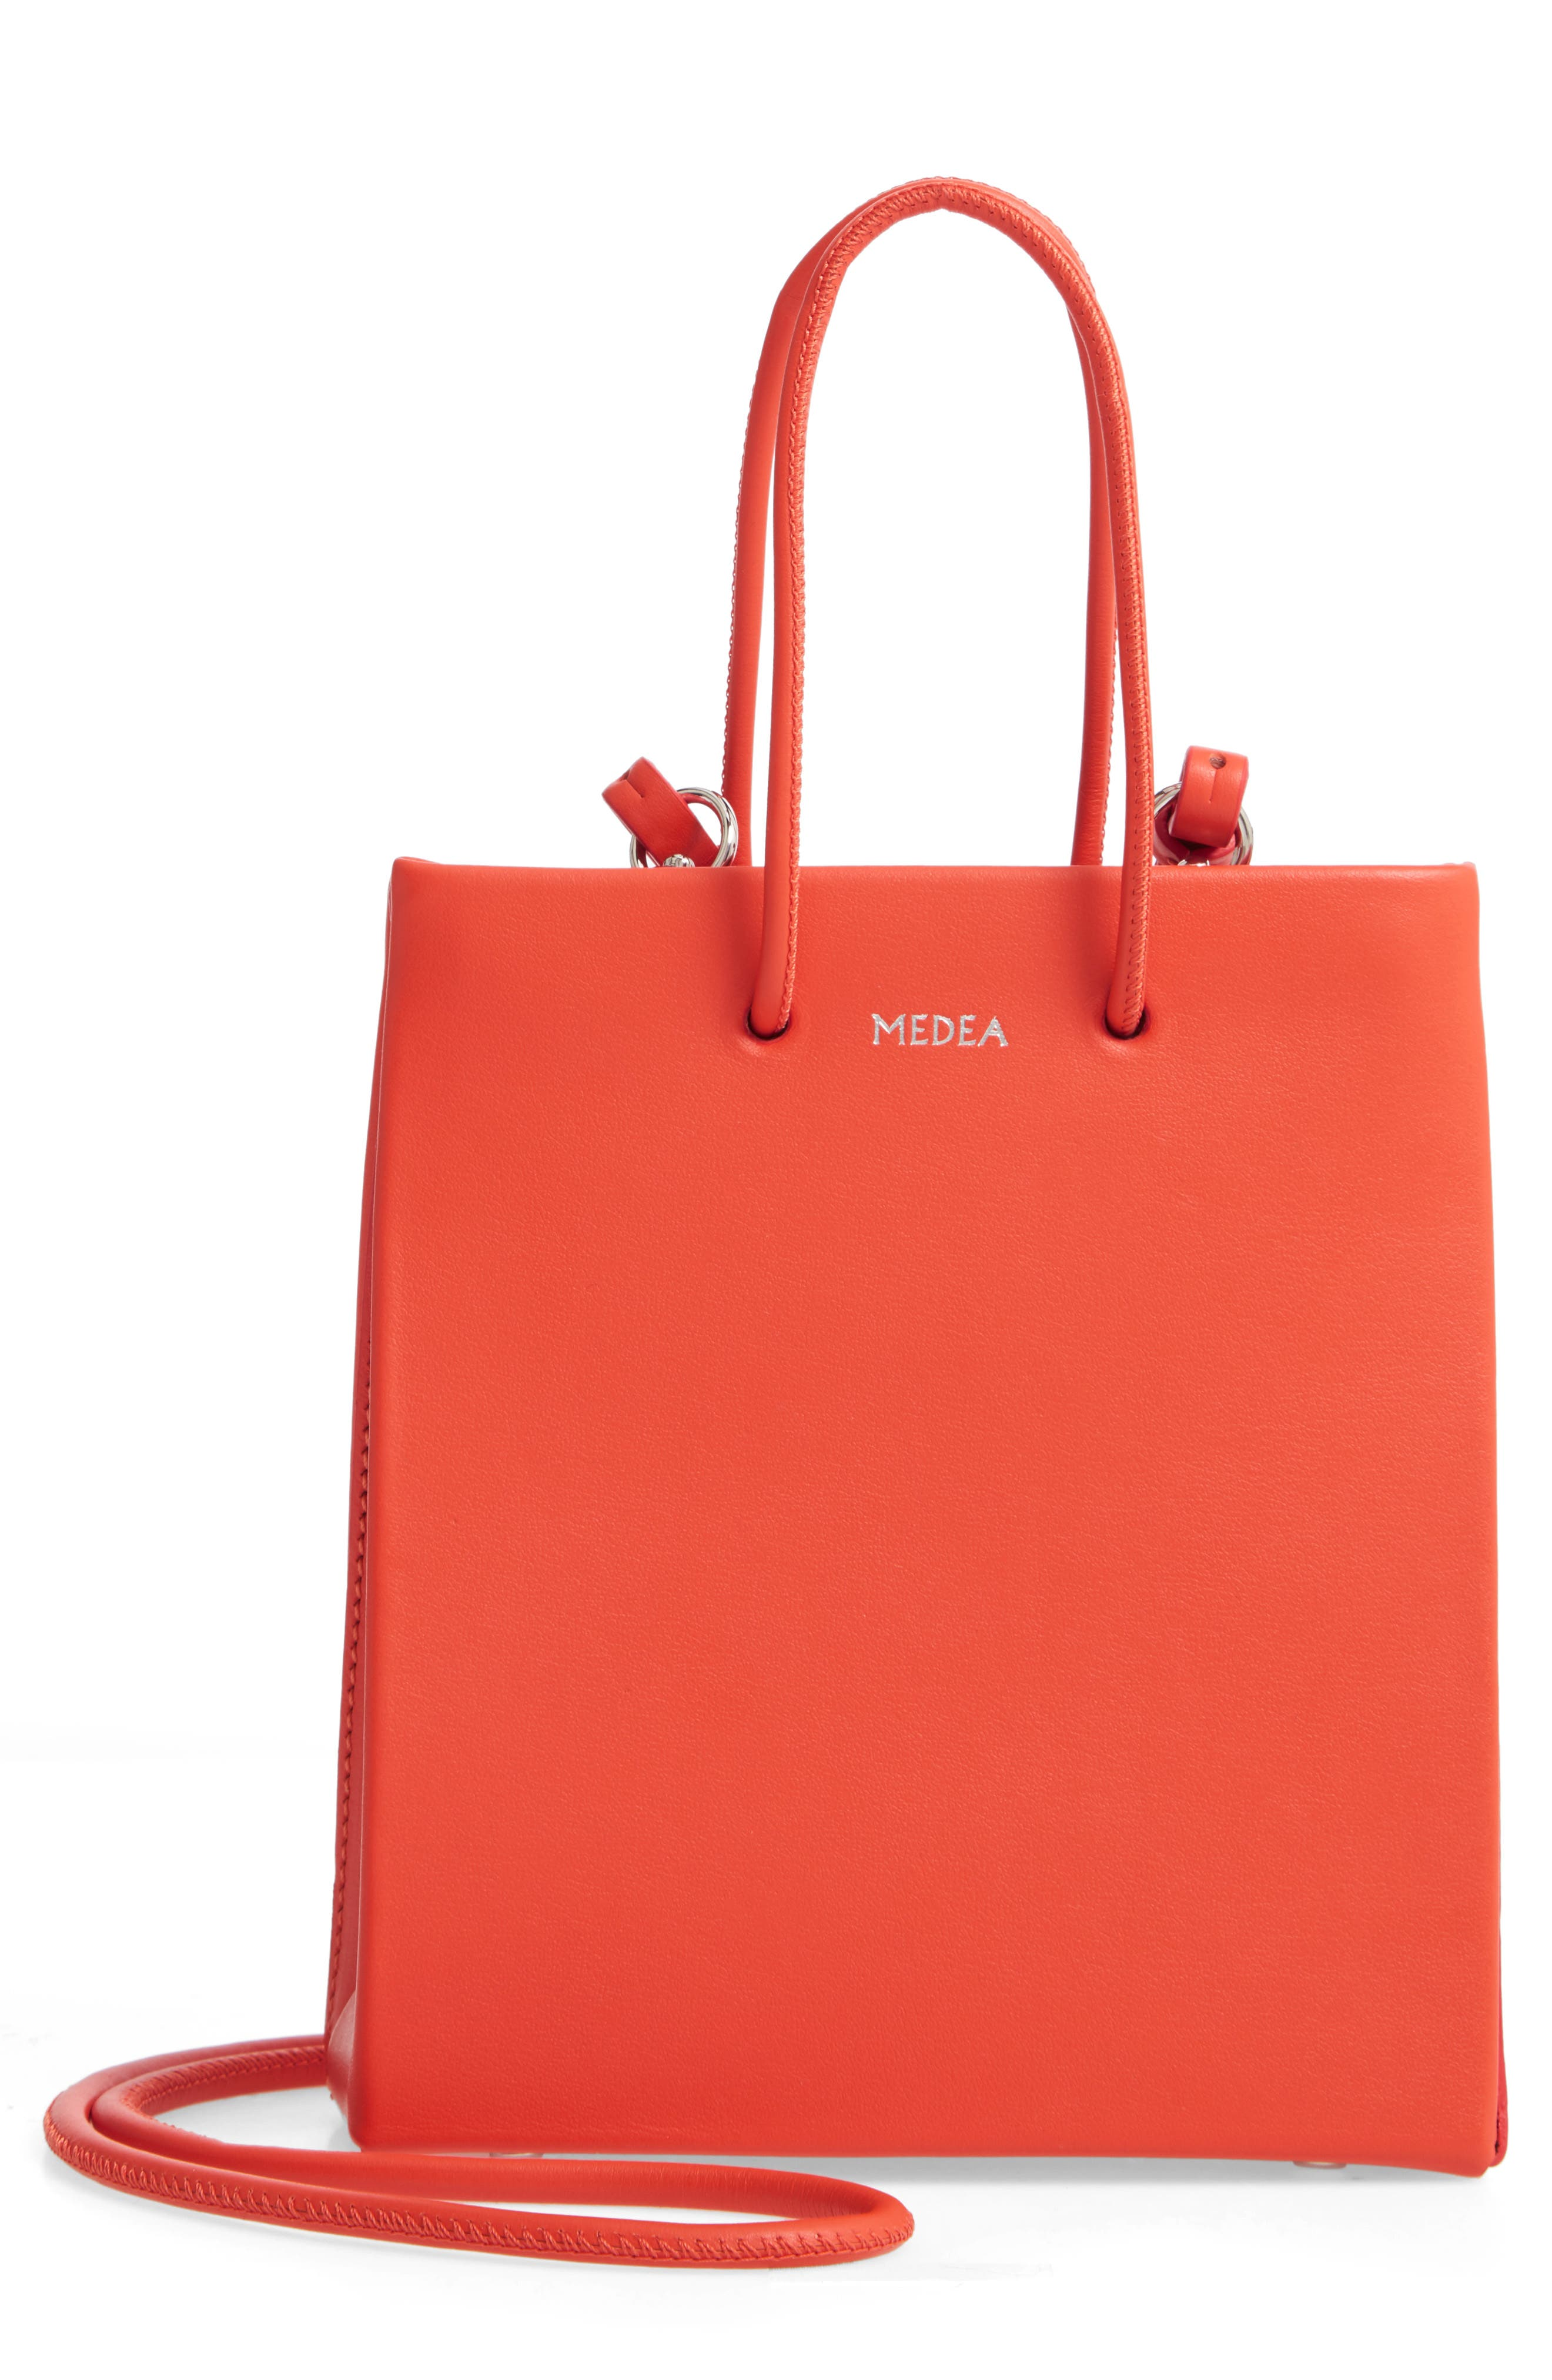 MEDEA Prima Short Calfskin Leather Bag, Main, color, ORANGE